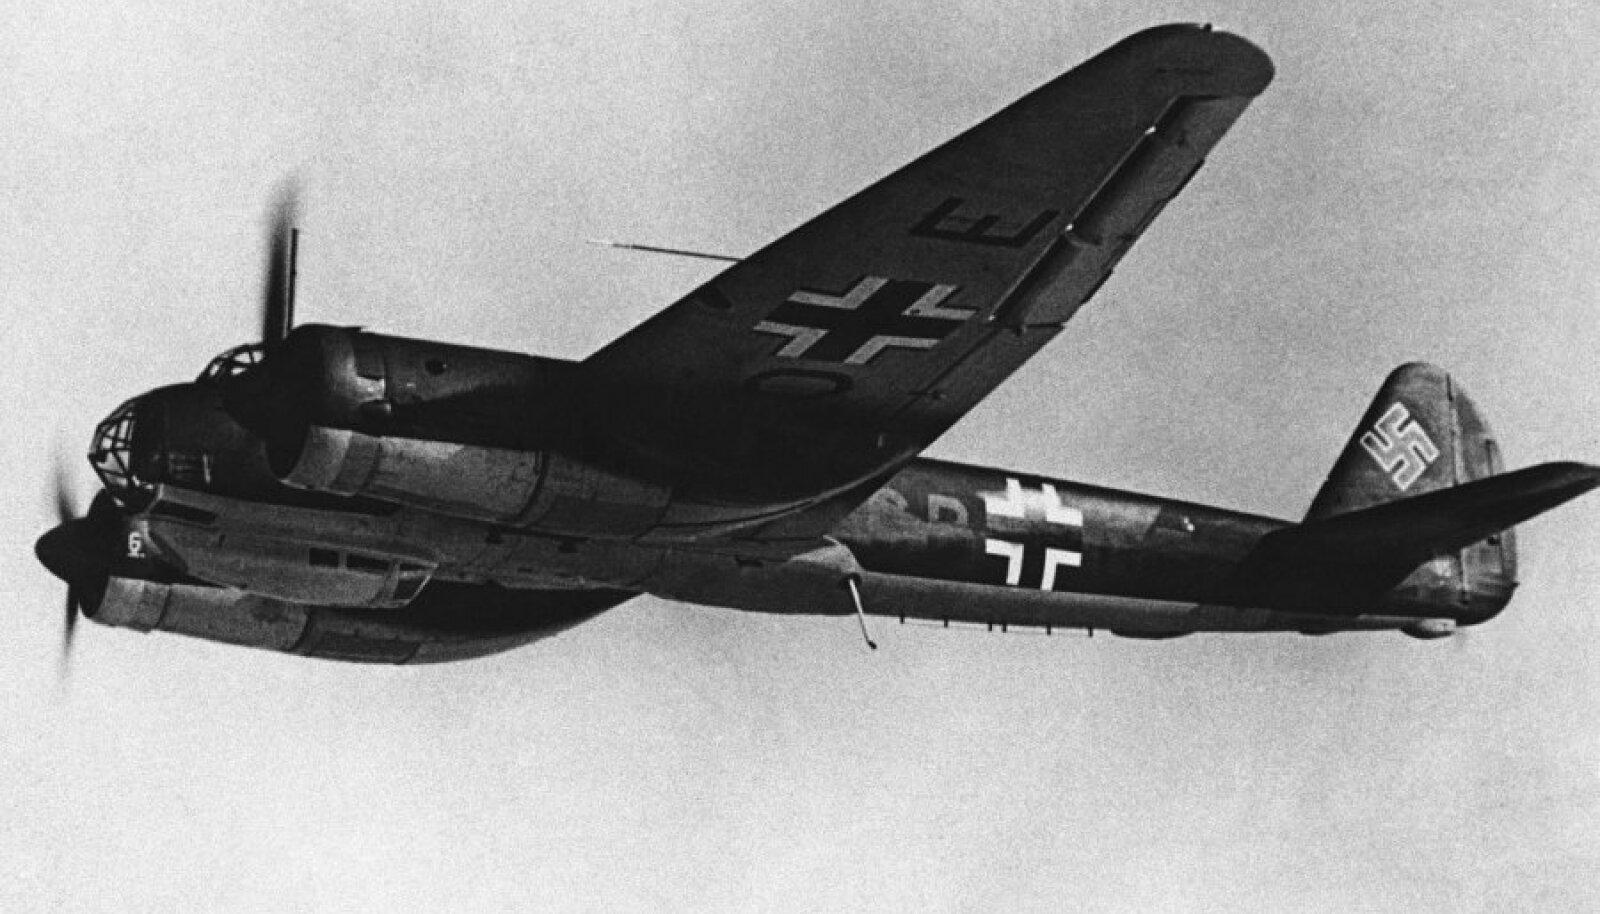 Pommitaja Junkers Ju 88